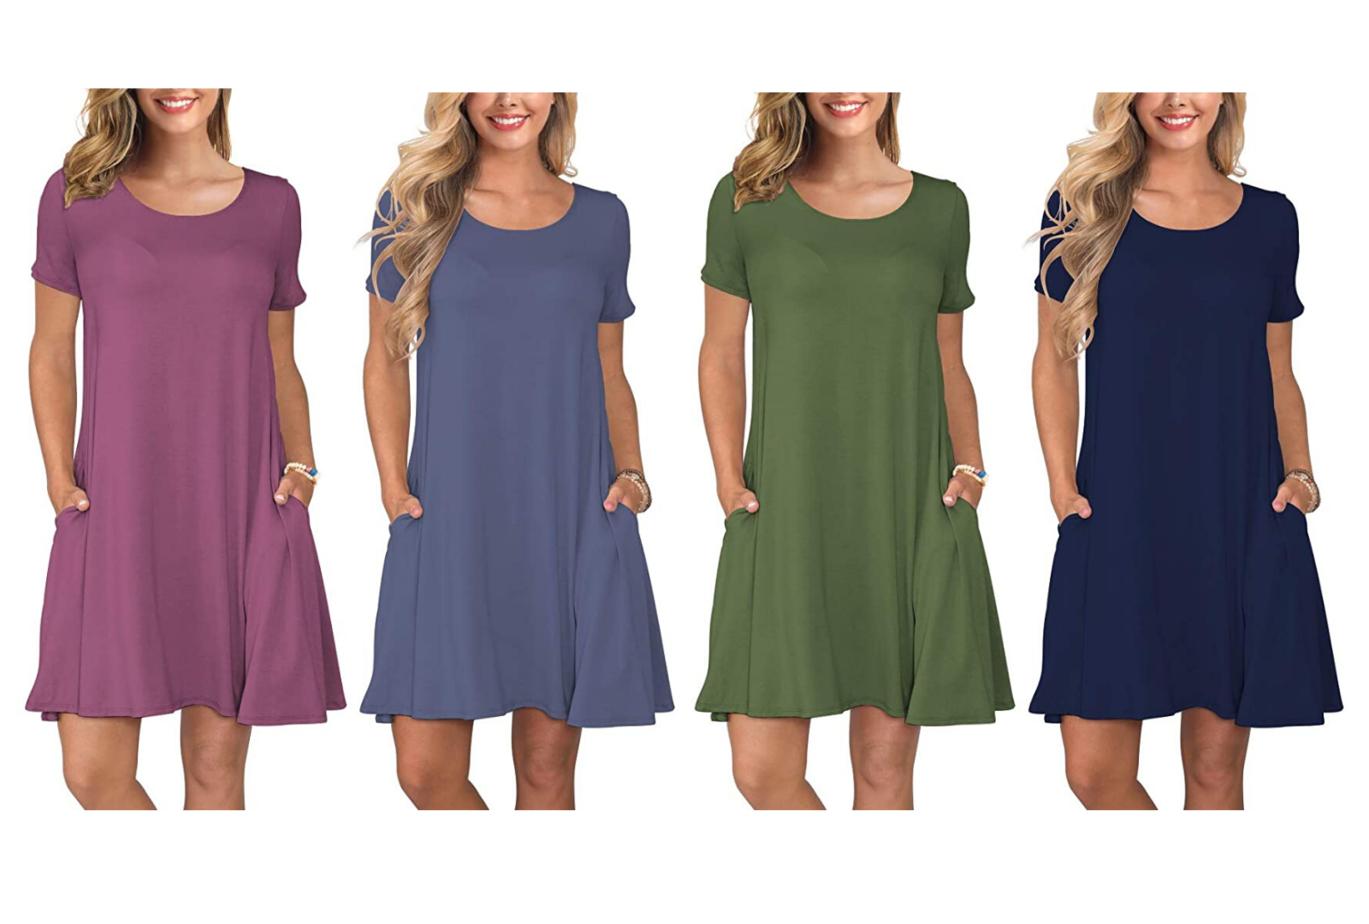 amazon loungewear dresses